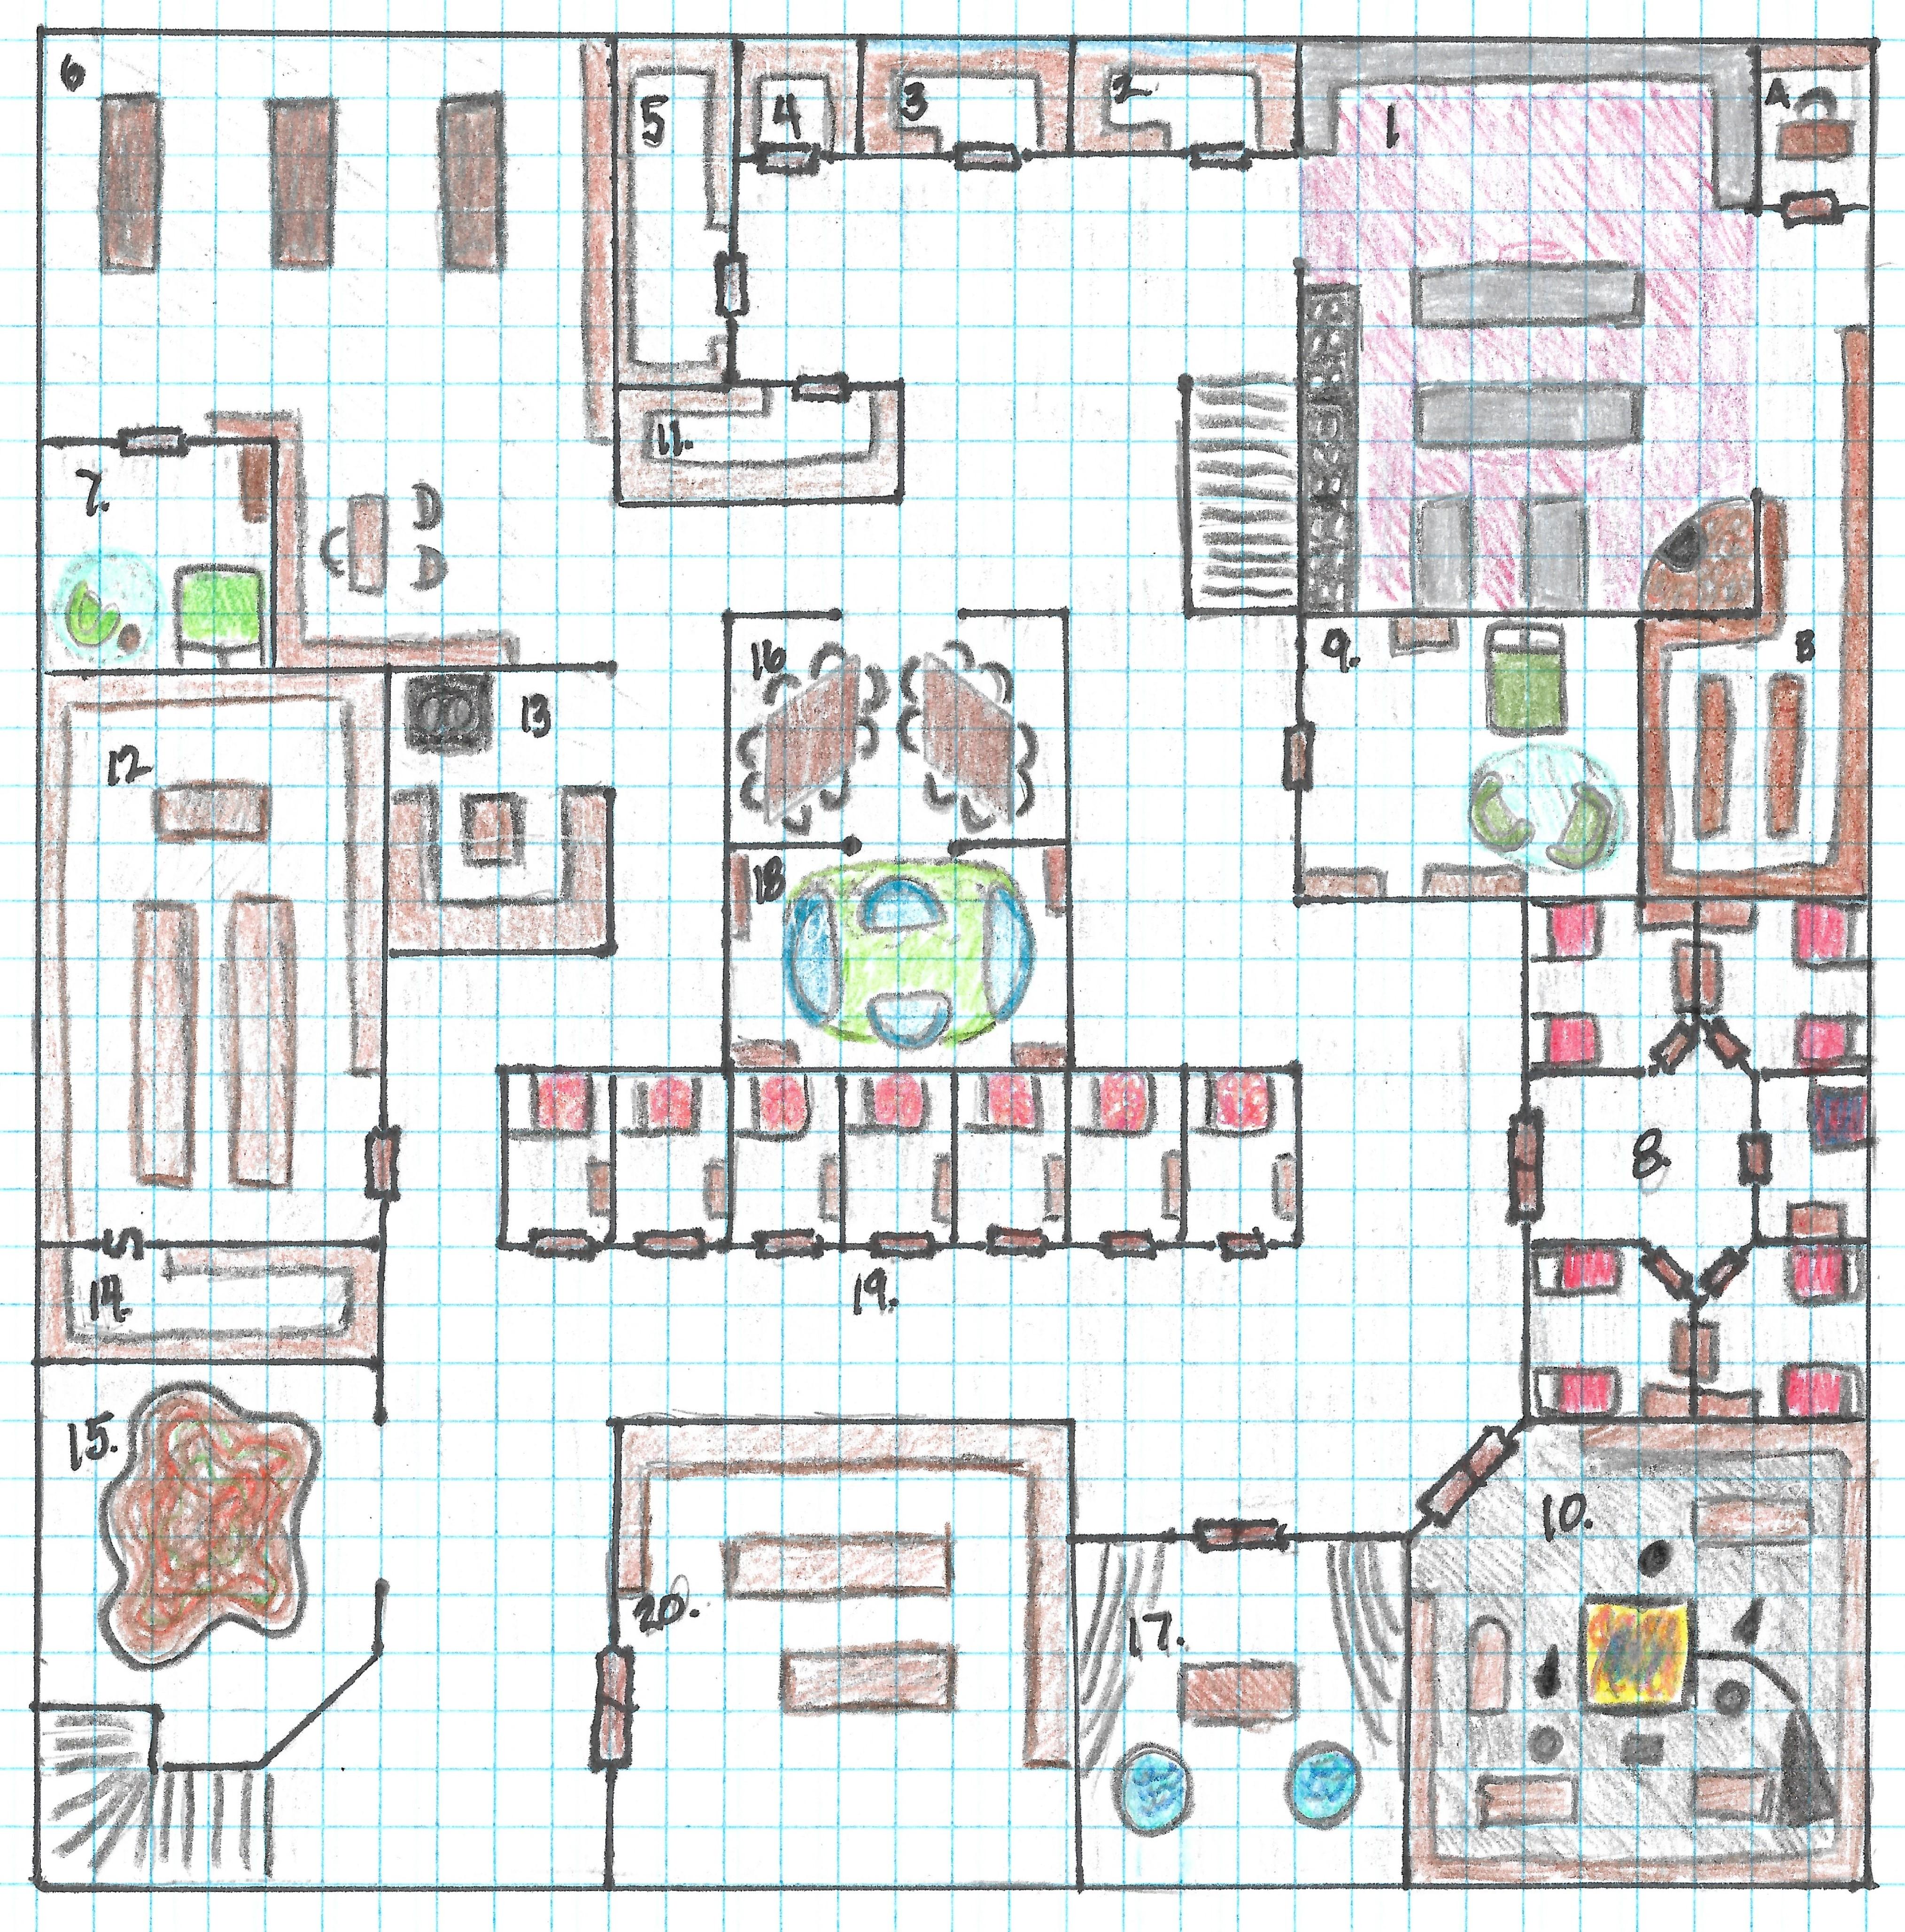 Stray_Manor_Basement.jpg